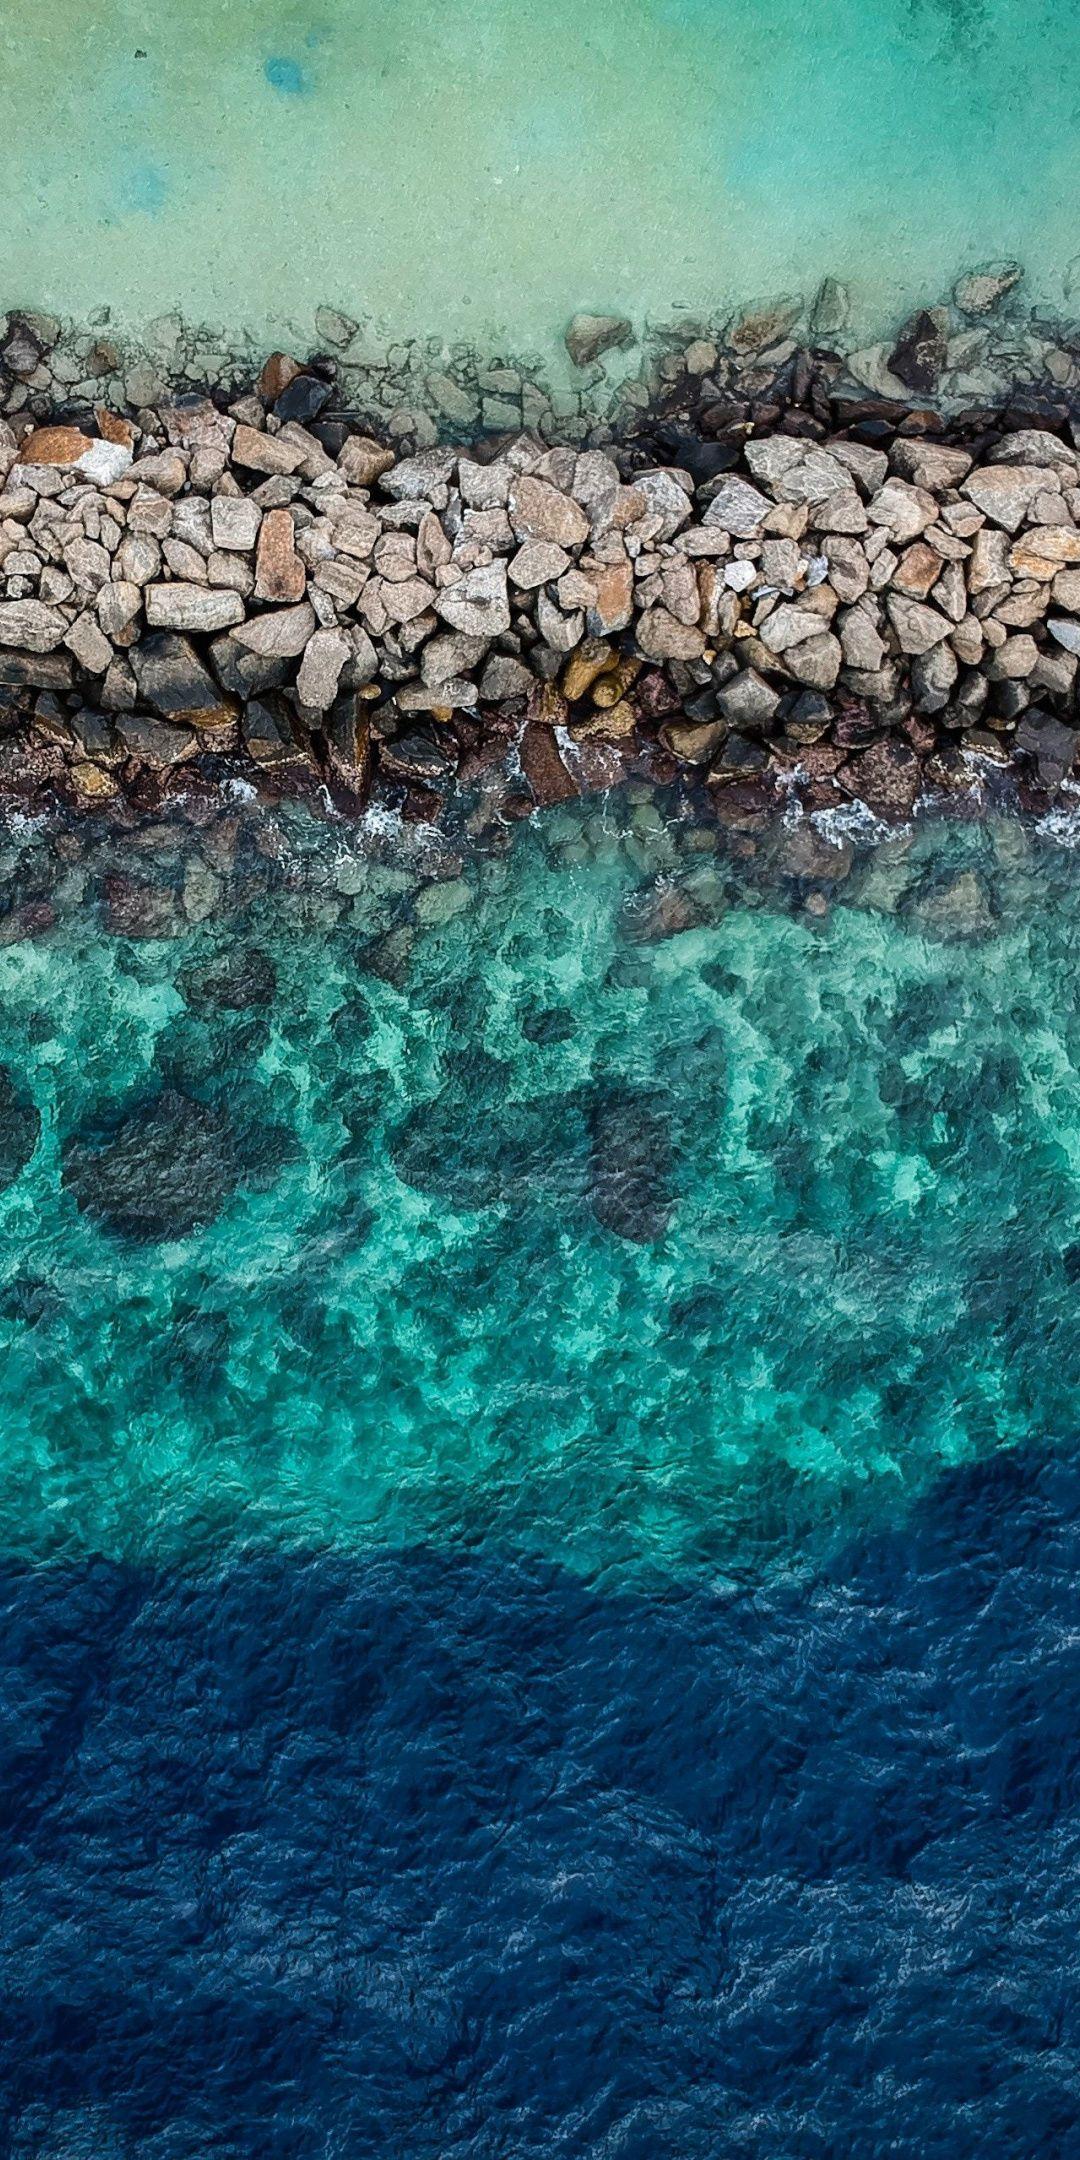 Blue Green Water Aerial View Rocks Coast 1080x2160 Wallpaper Nature Iphone Wallpaper View Wallpaper Ocean Wallpaper